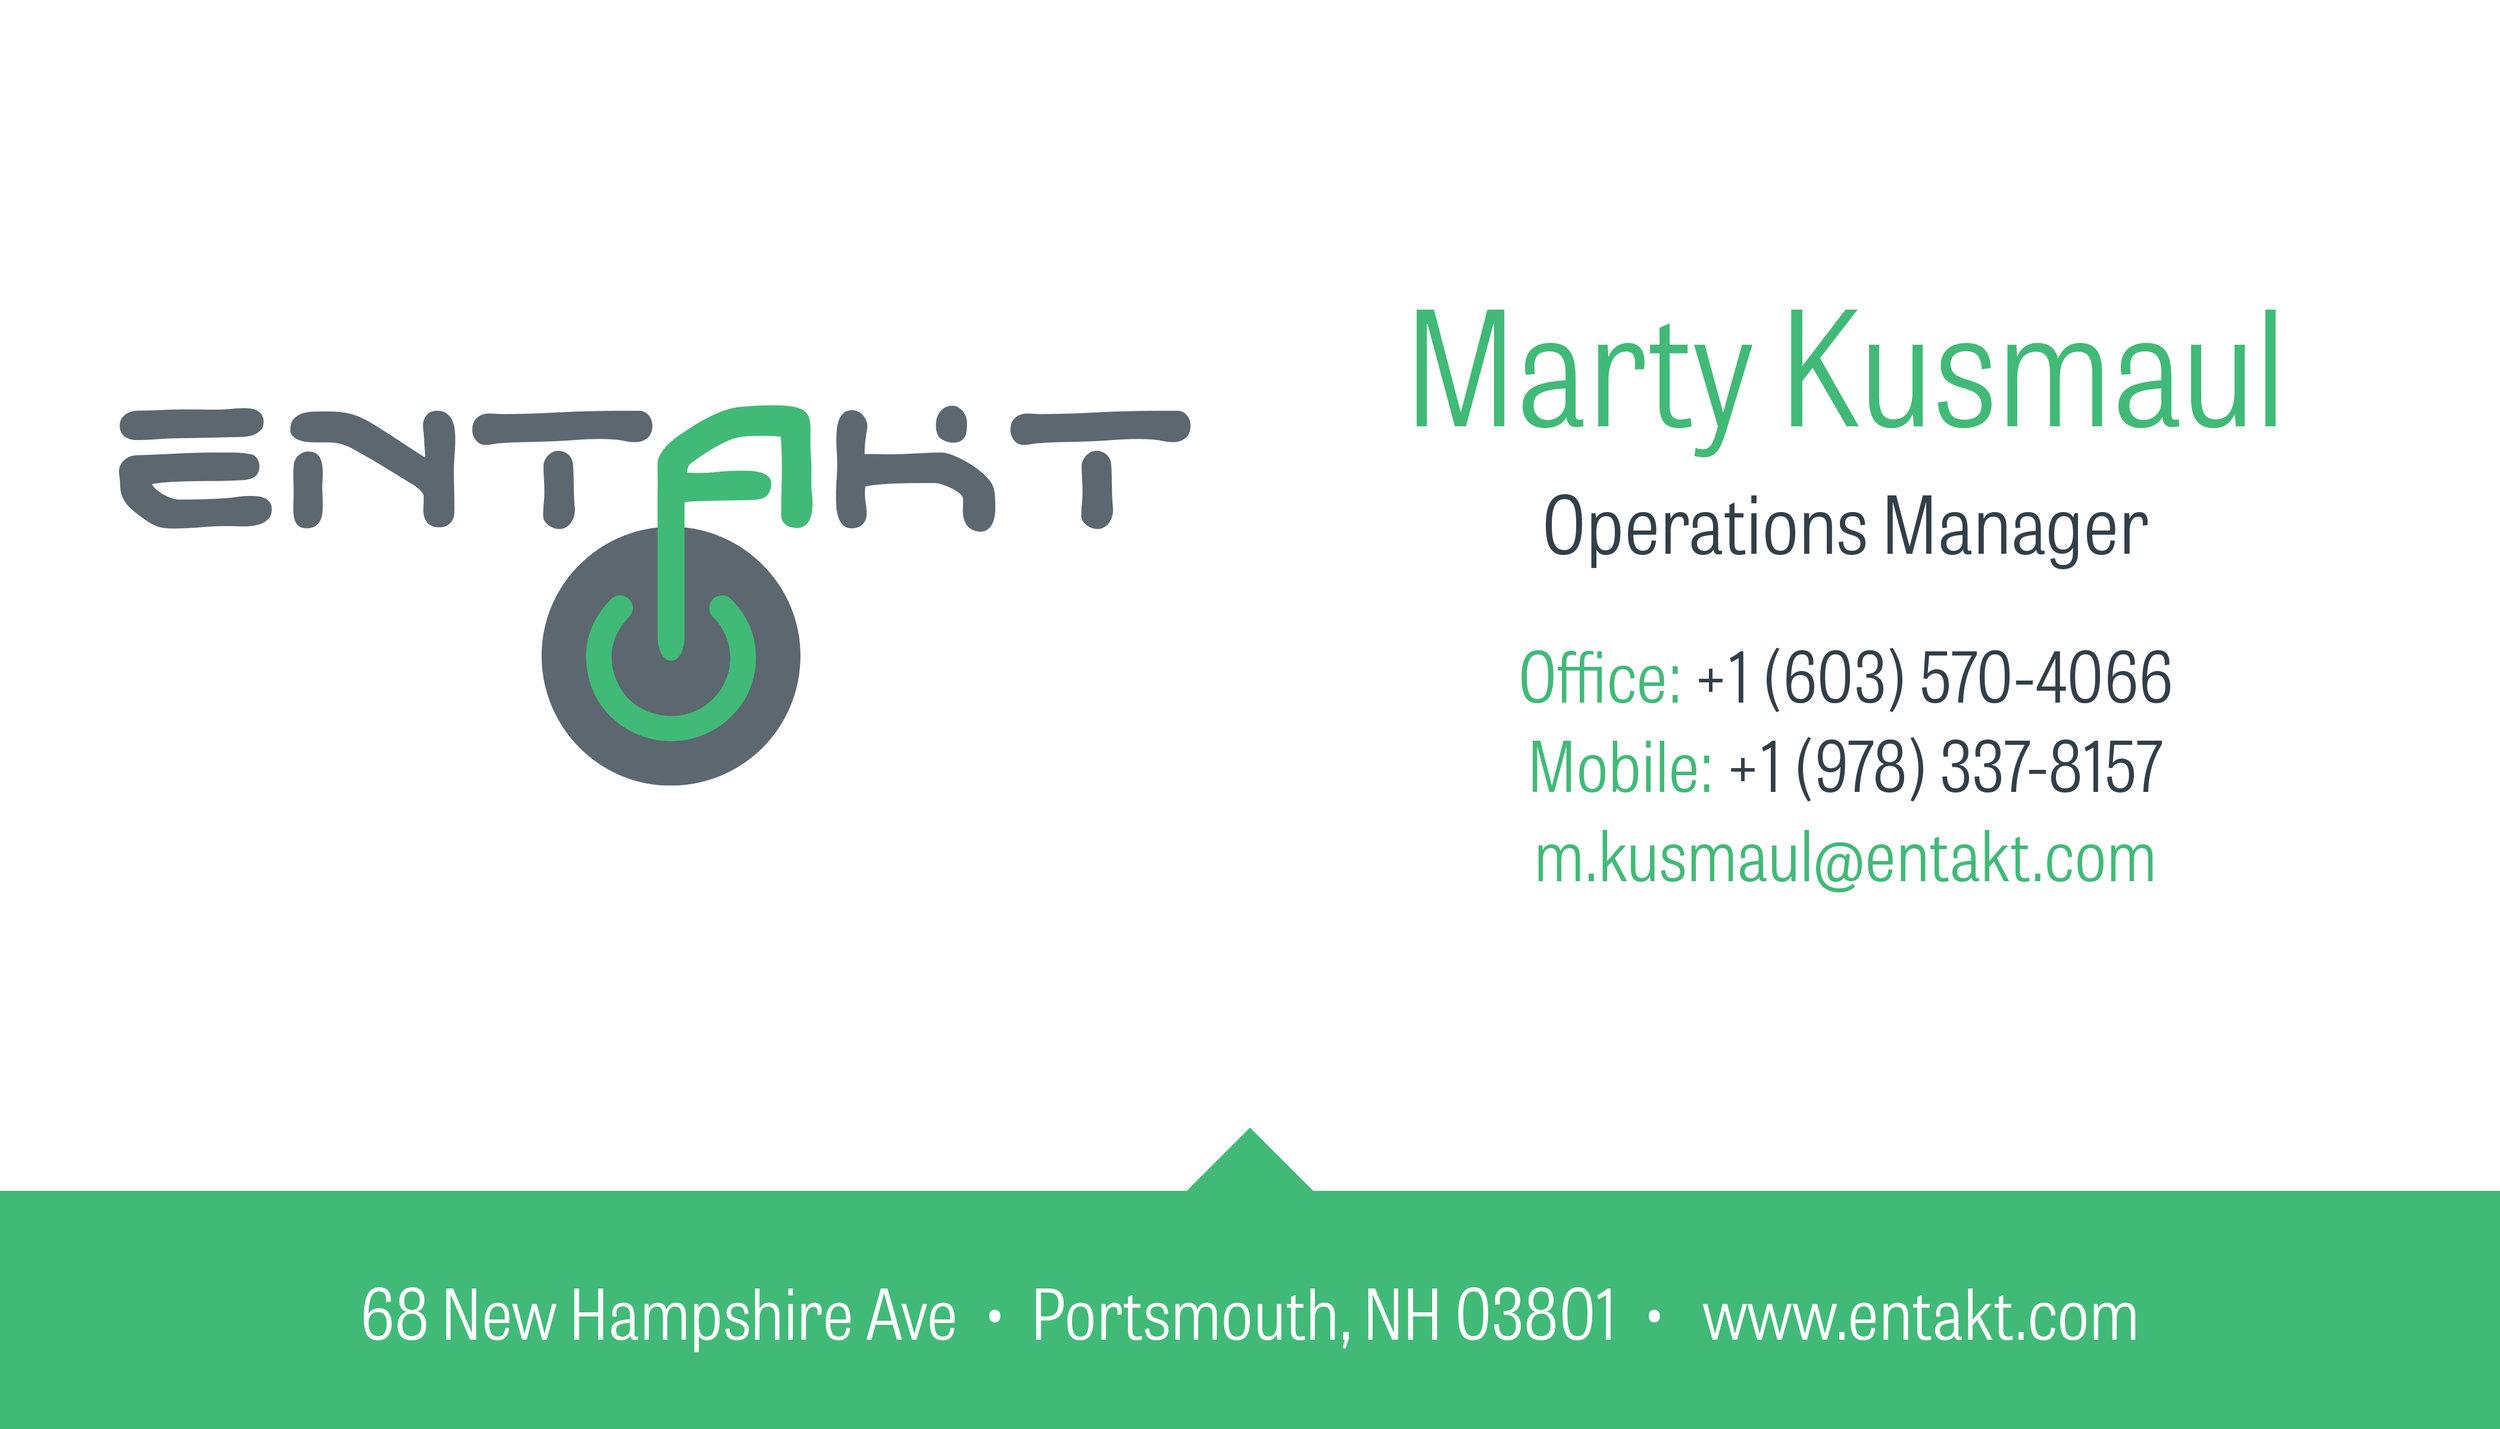 Marty Kusmaul ENTAKT Card BLEED-1.jpg